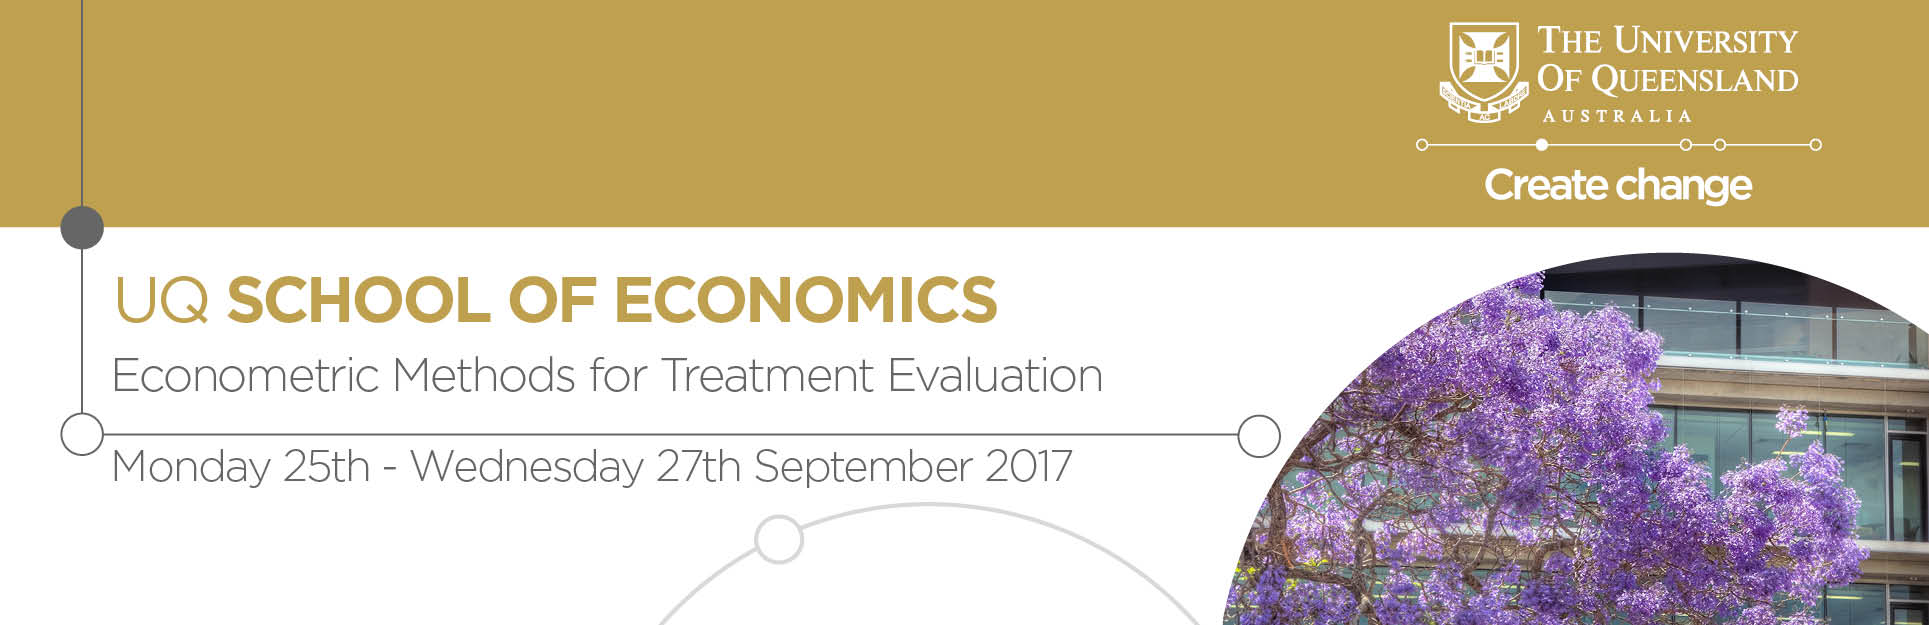 Econometric Methods for Treatment Evaluation 2017